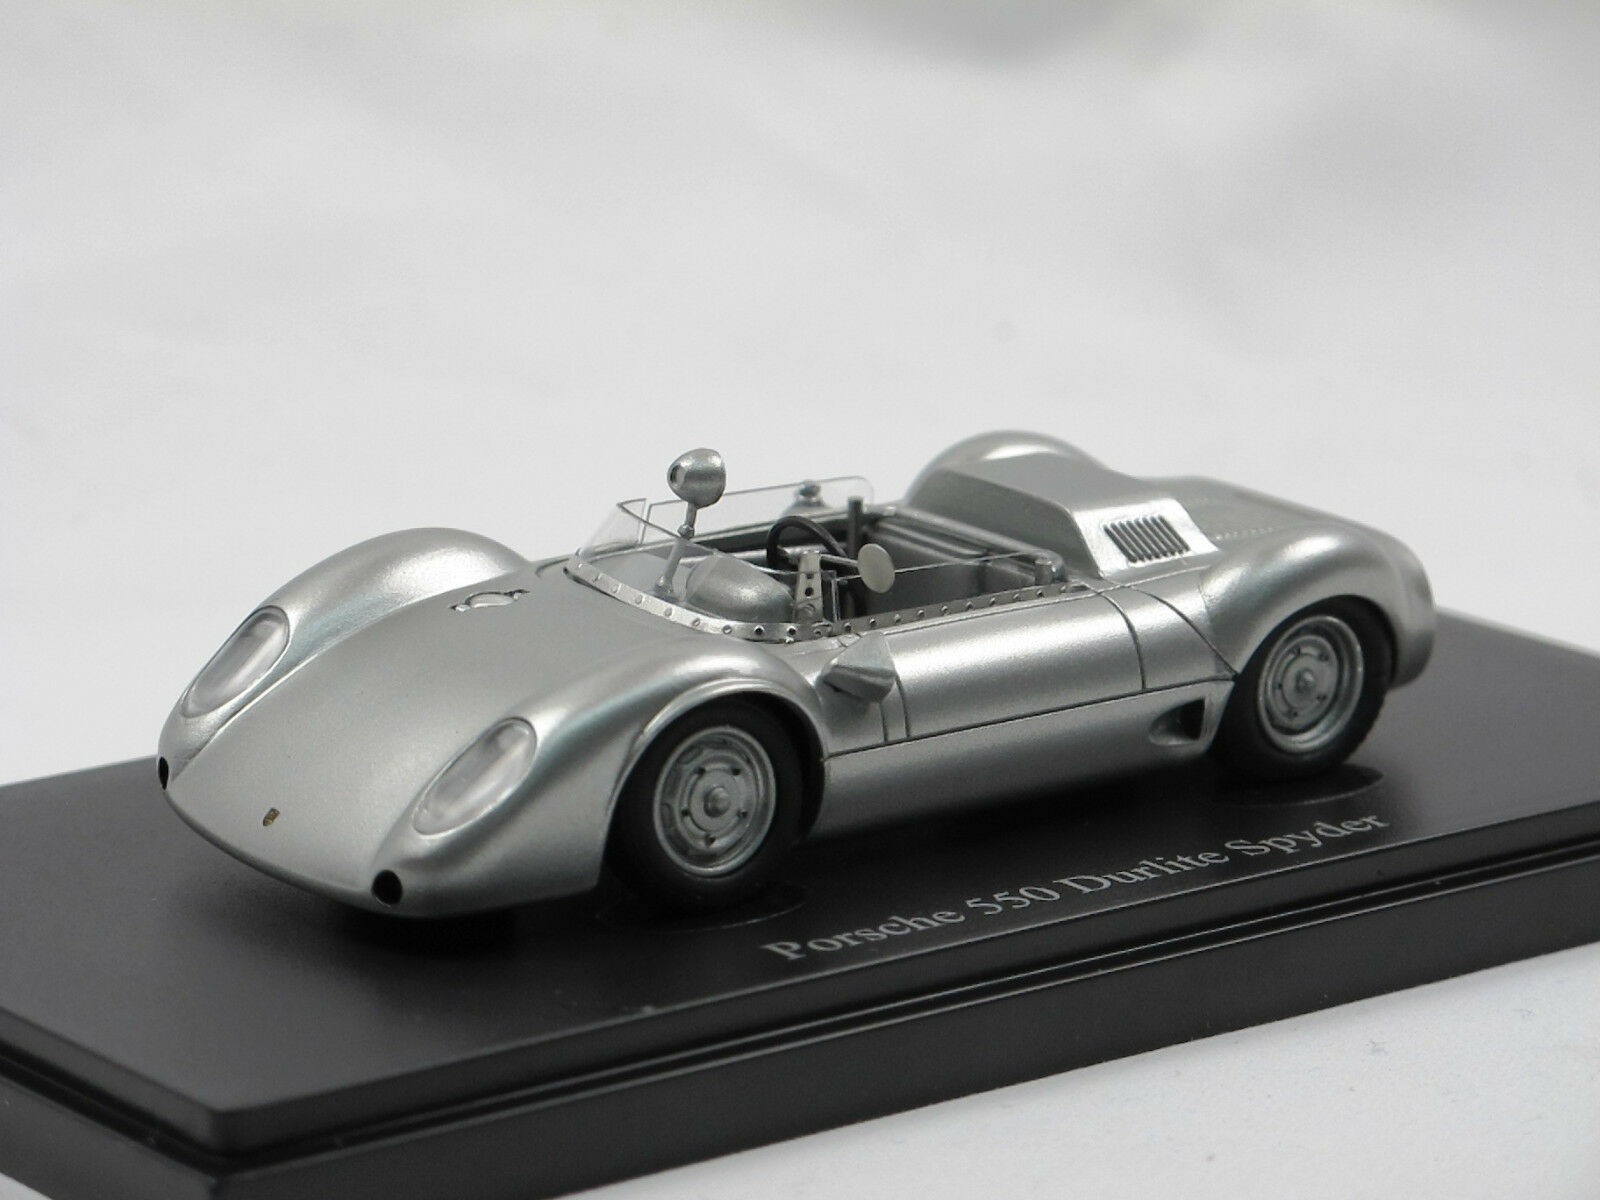 AutoCult Models 07007, 1959 Porsche 550 Durlite Spyder 1 43 Limited Edition